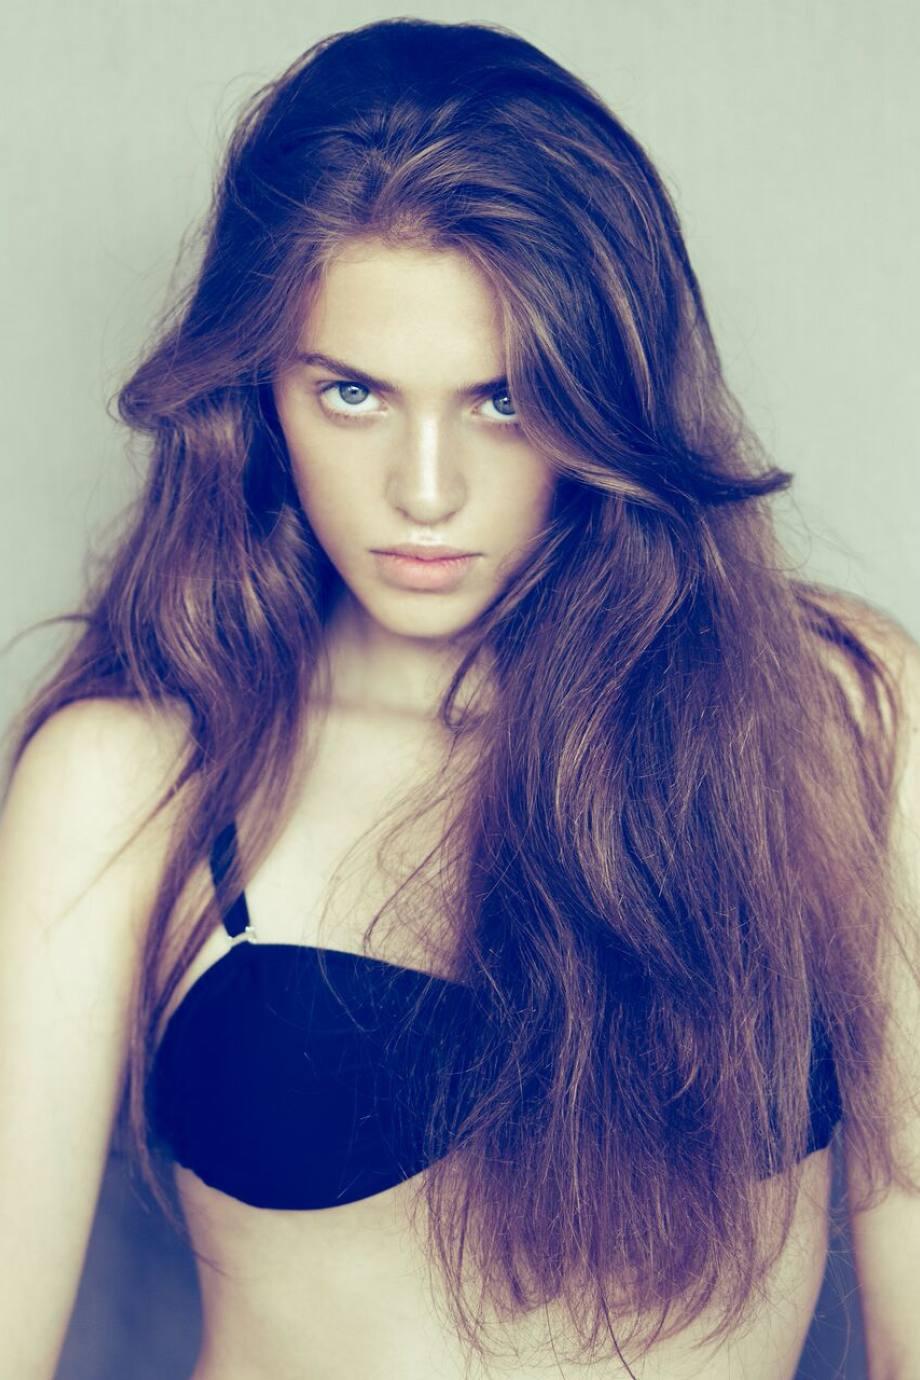 Angelika Banach - Female Fashion Models - Bellazon